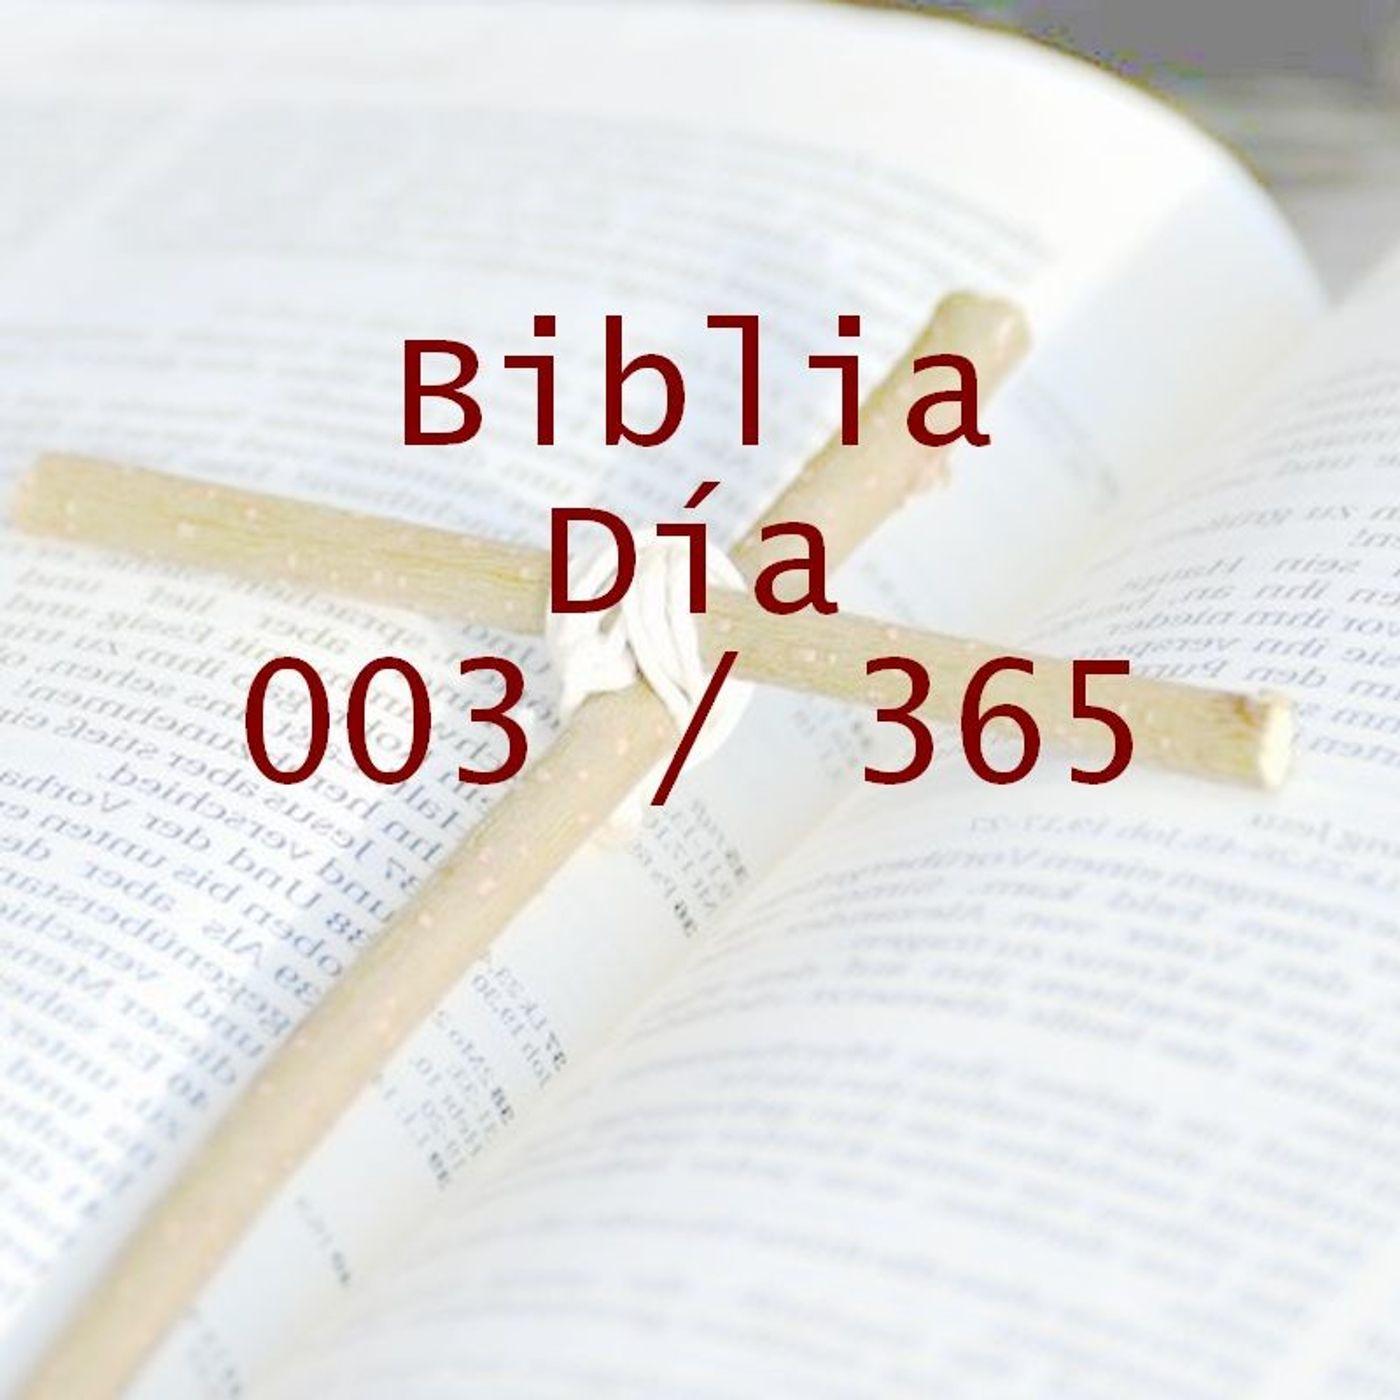 365 dias para la Biblia - Dia 003